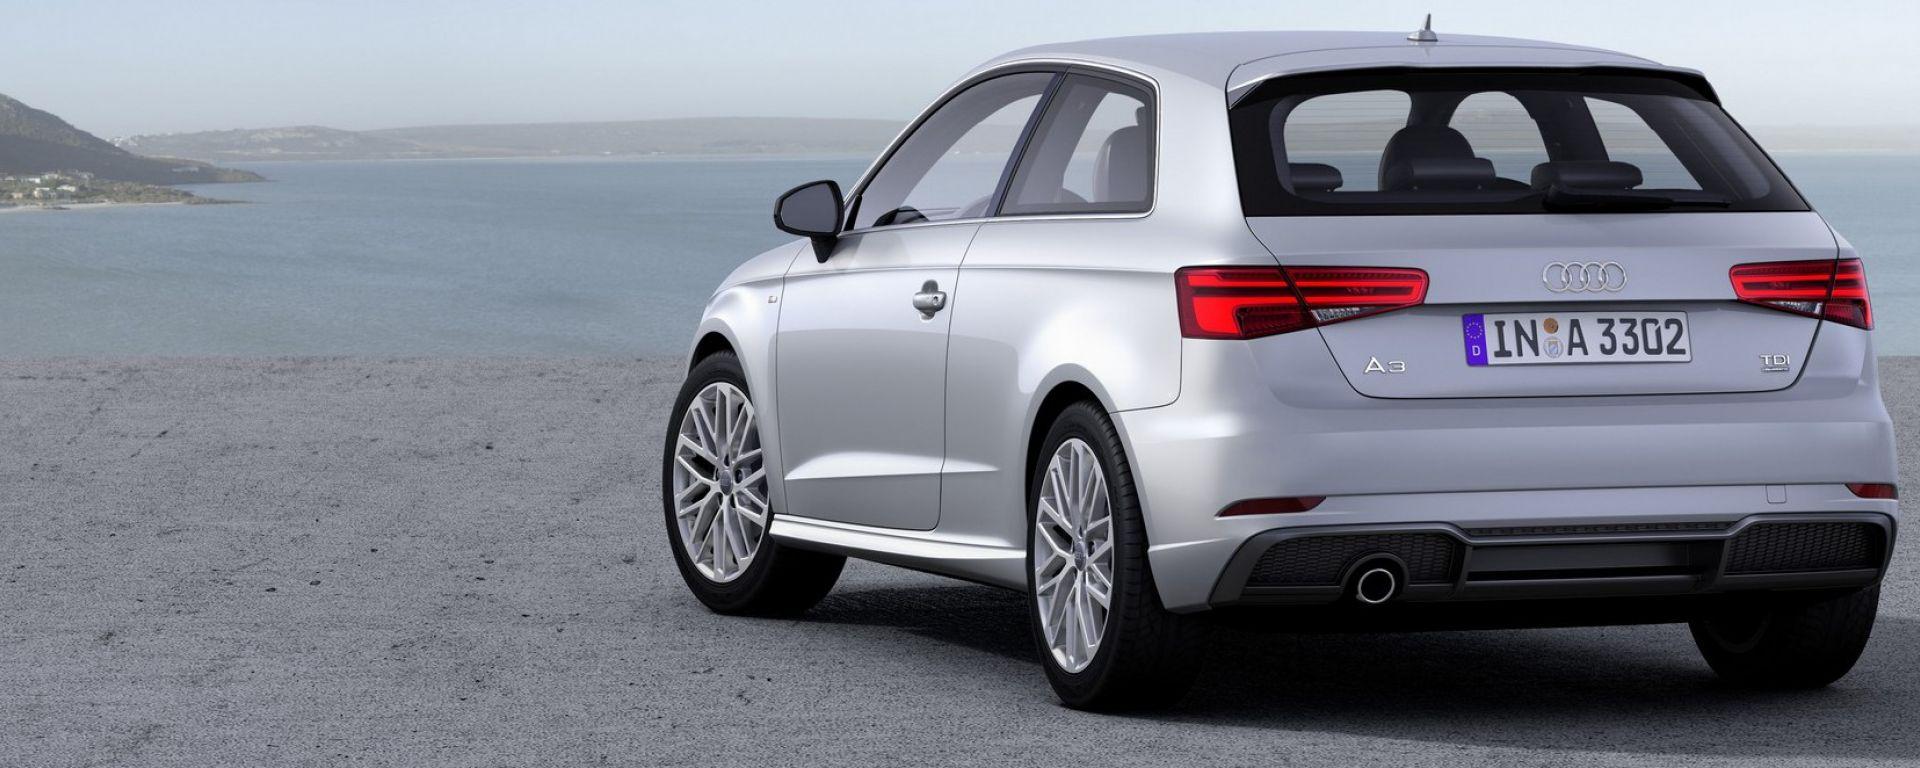 Audi A3 2.0 TDI Euro: un nuovo dieselgate?